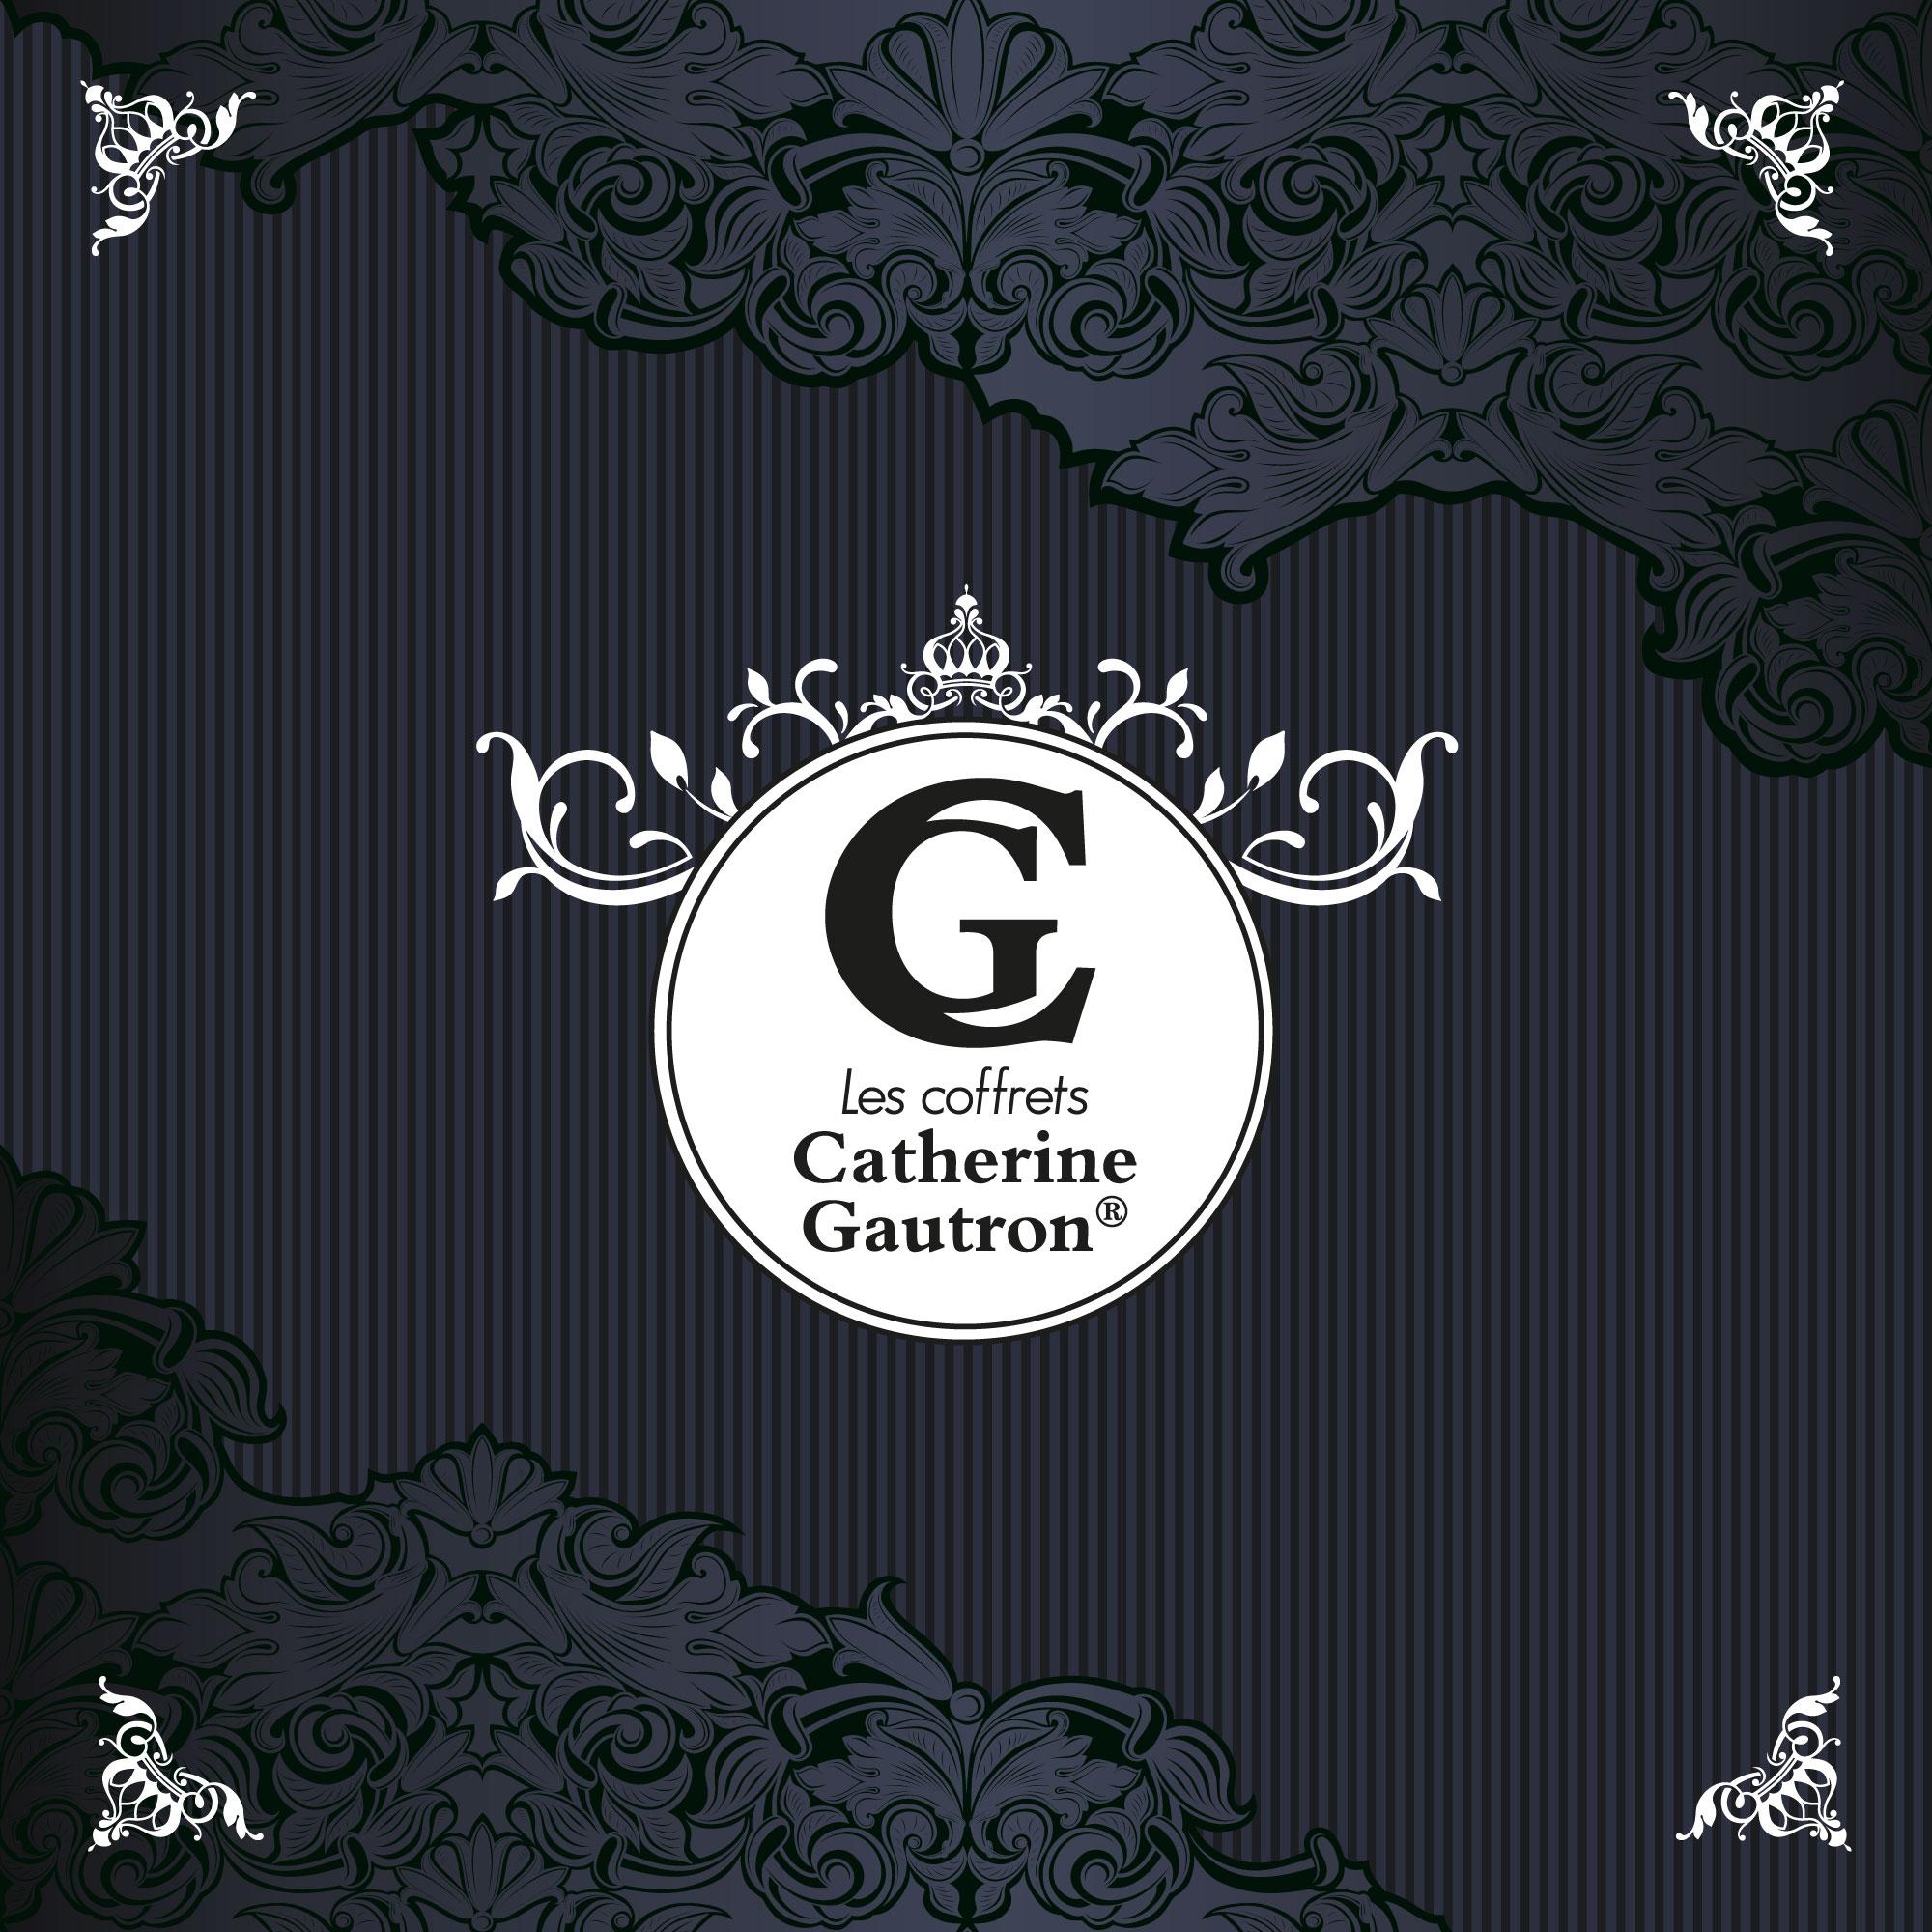 coffret-cadeau-catherine-gautron